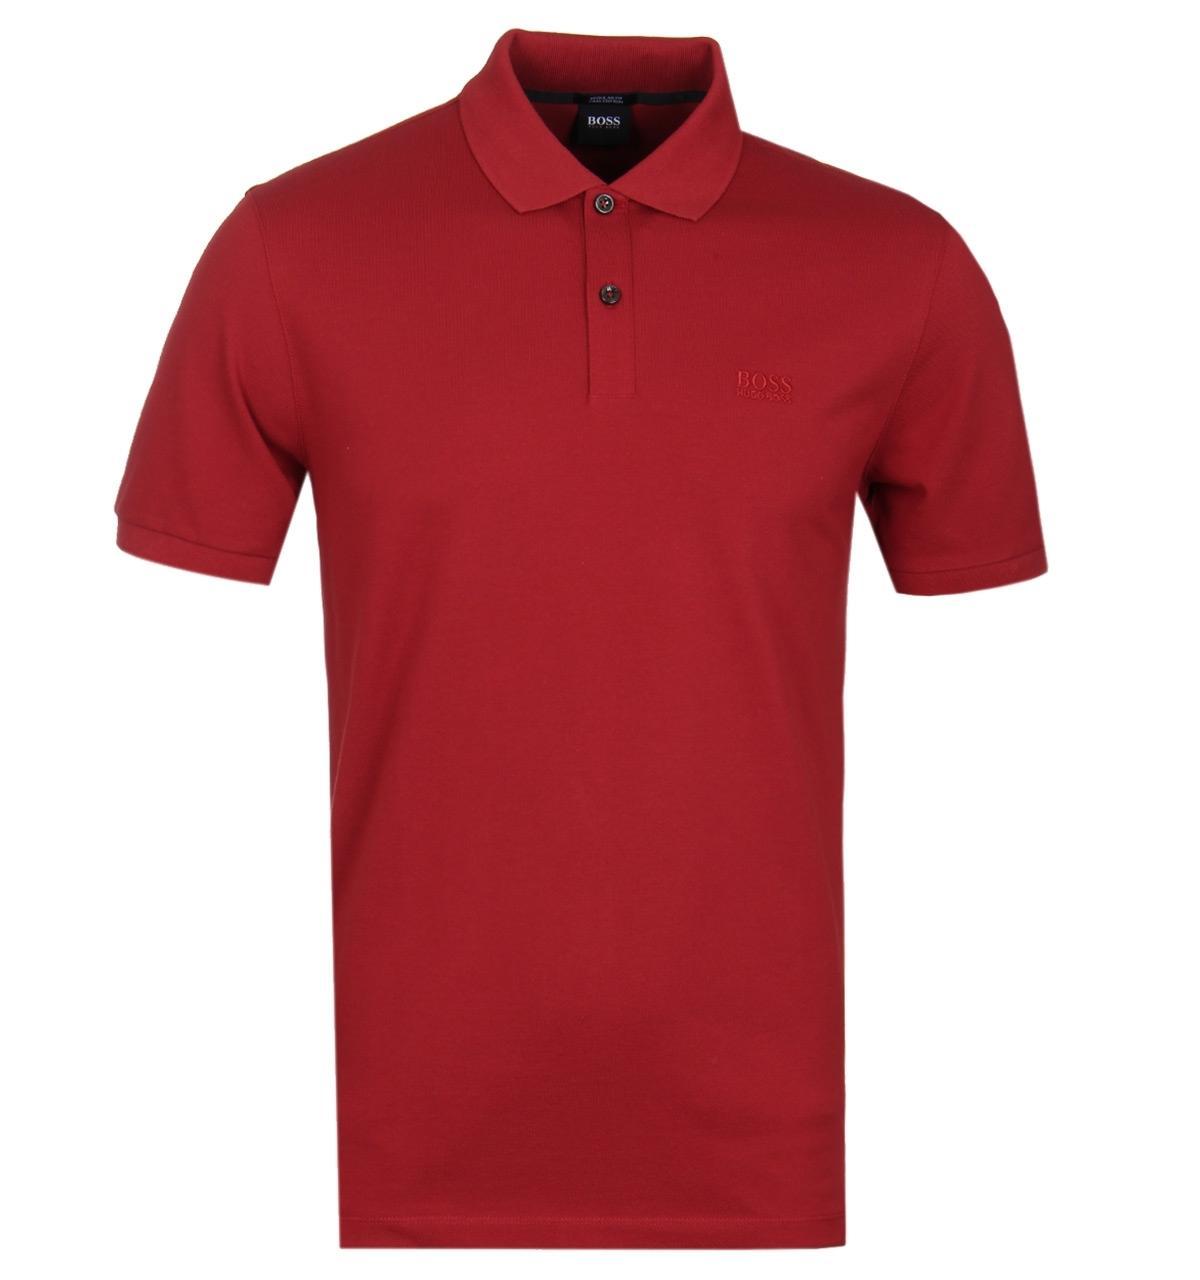 3e62339f BOSS - Pima Pique Dark Red Polo Shirt for Men - Lyst. View fullscreen